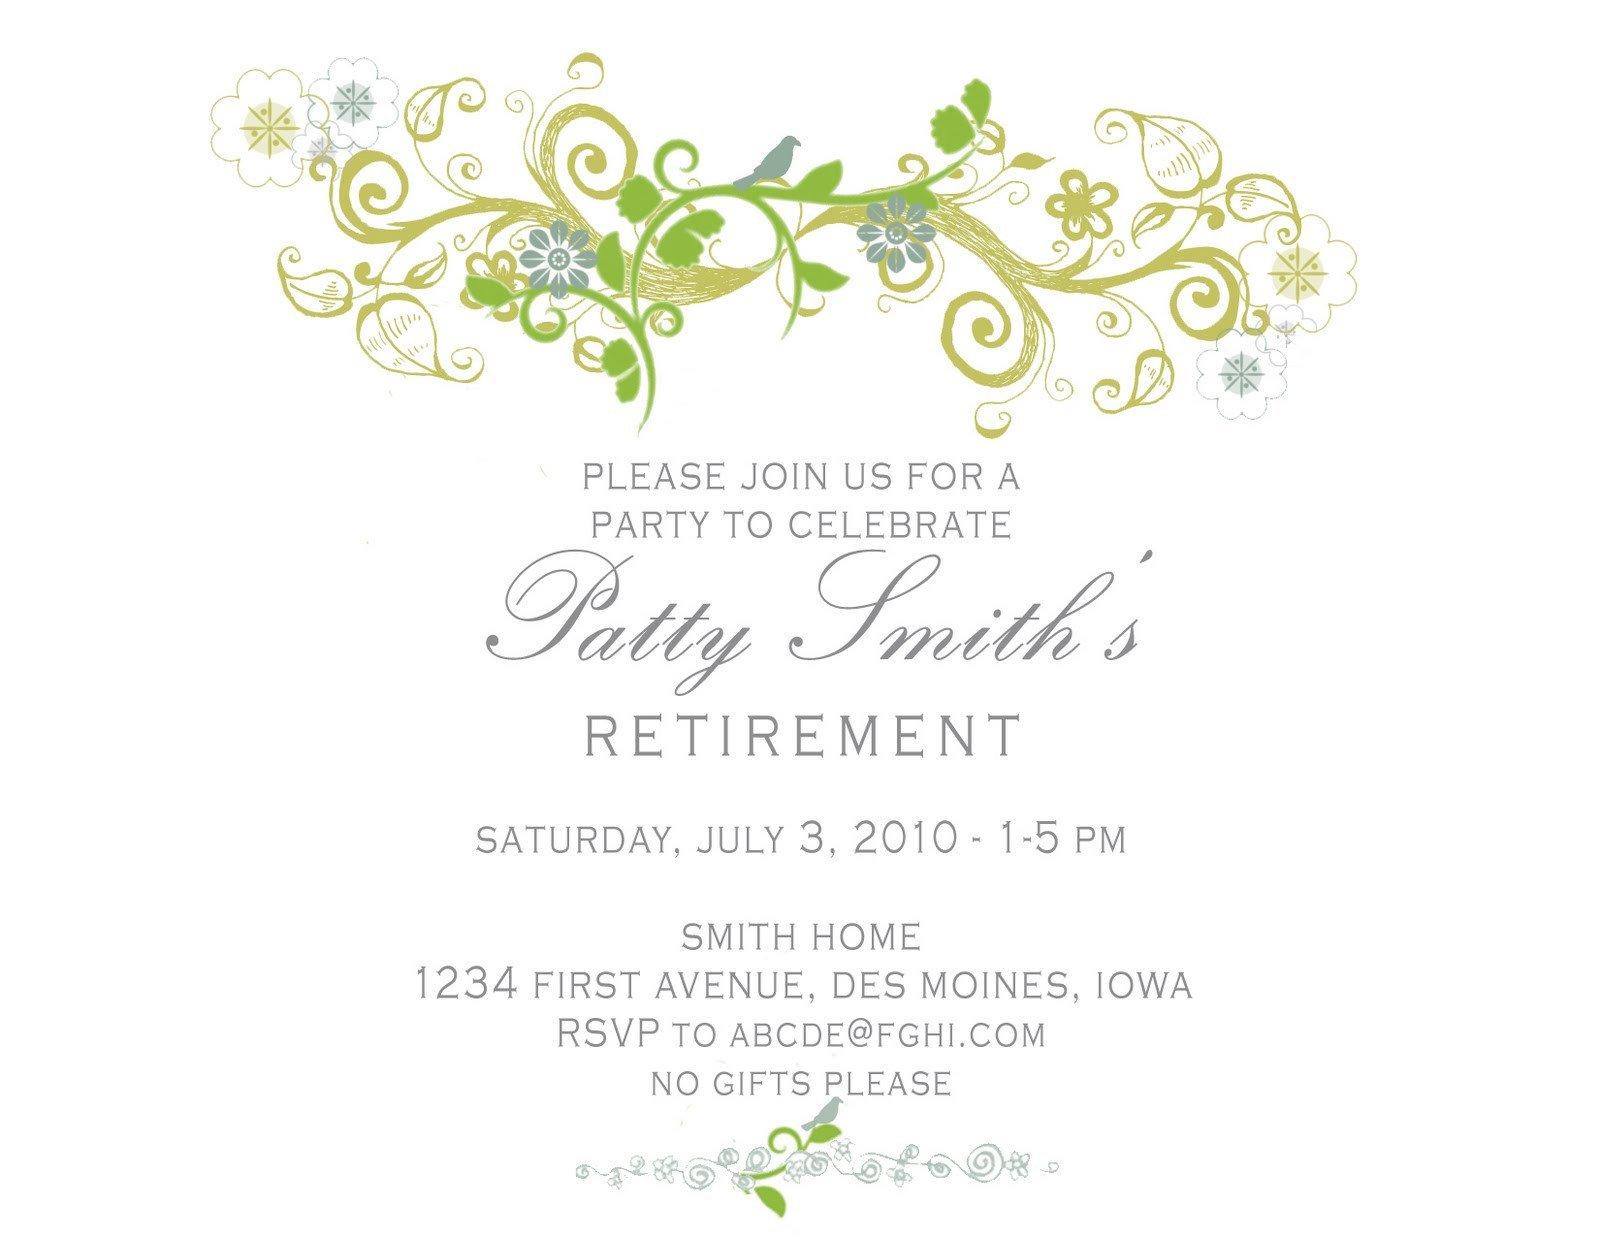 Retirement Invitation Template Free Idesign A Retirement Party Invitation